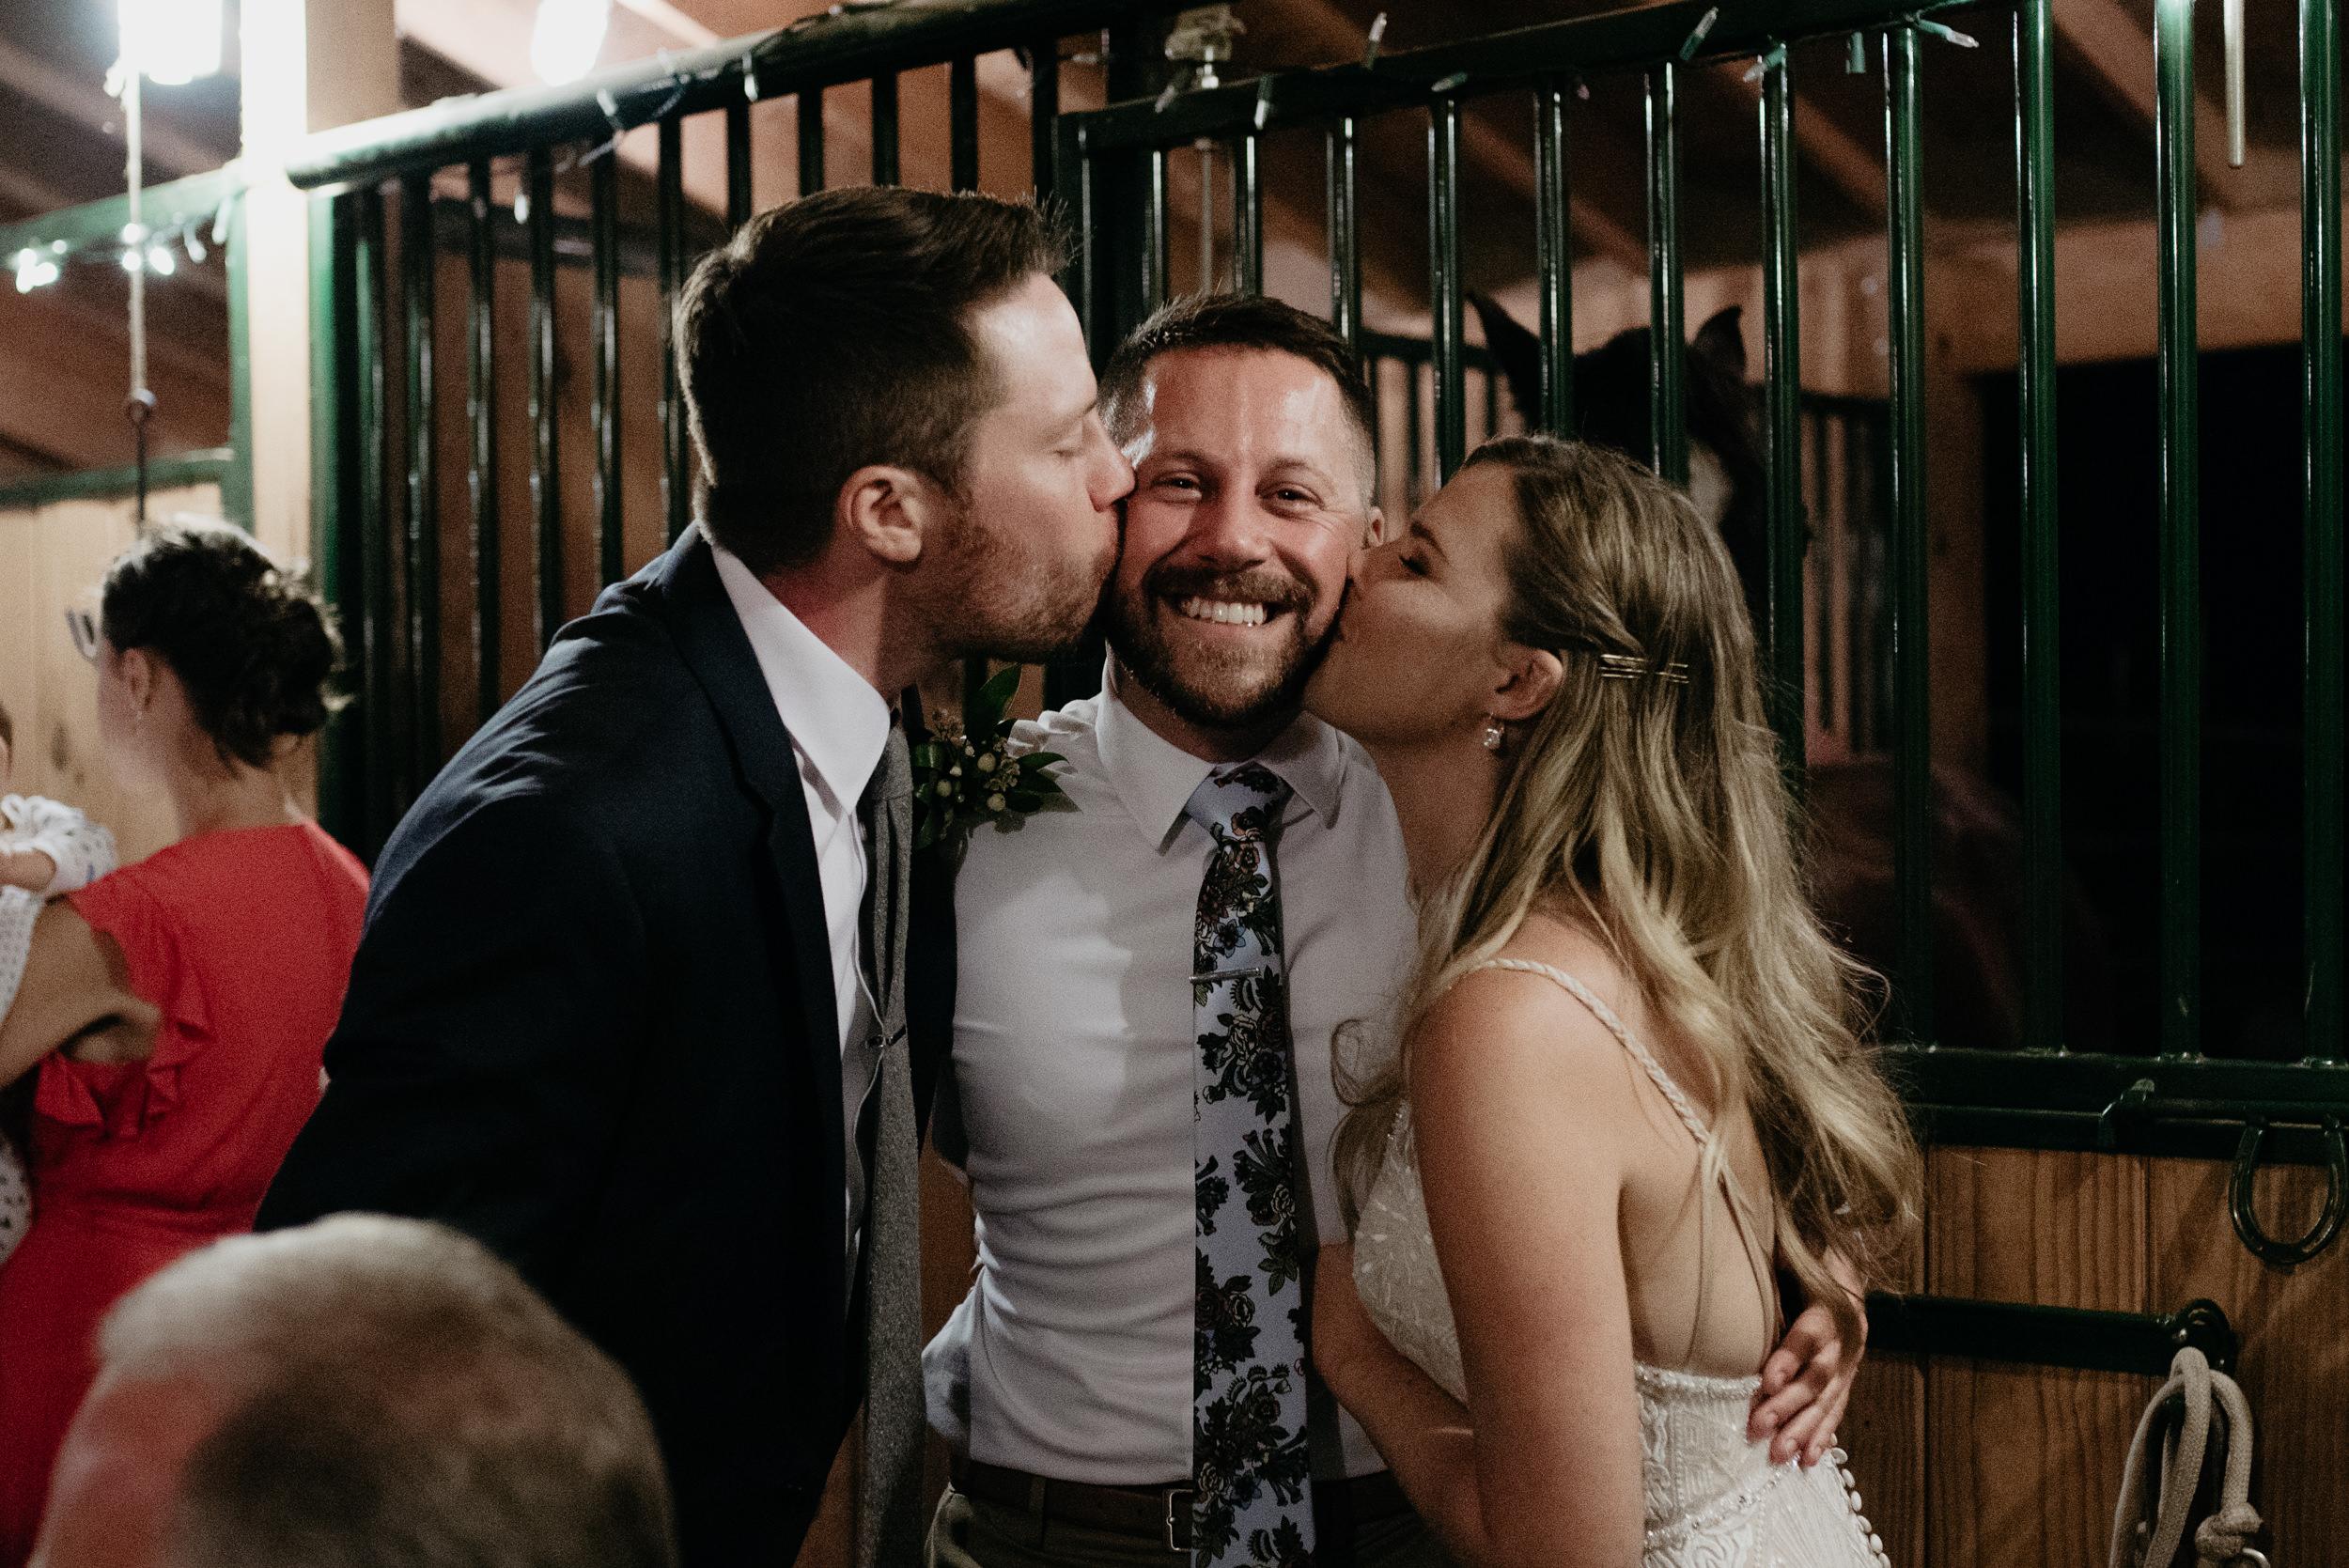 Estes Park wedding photographer. Colorado wedding and elopement photographer.